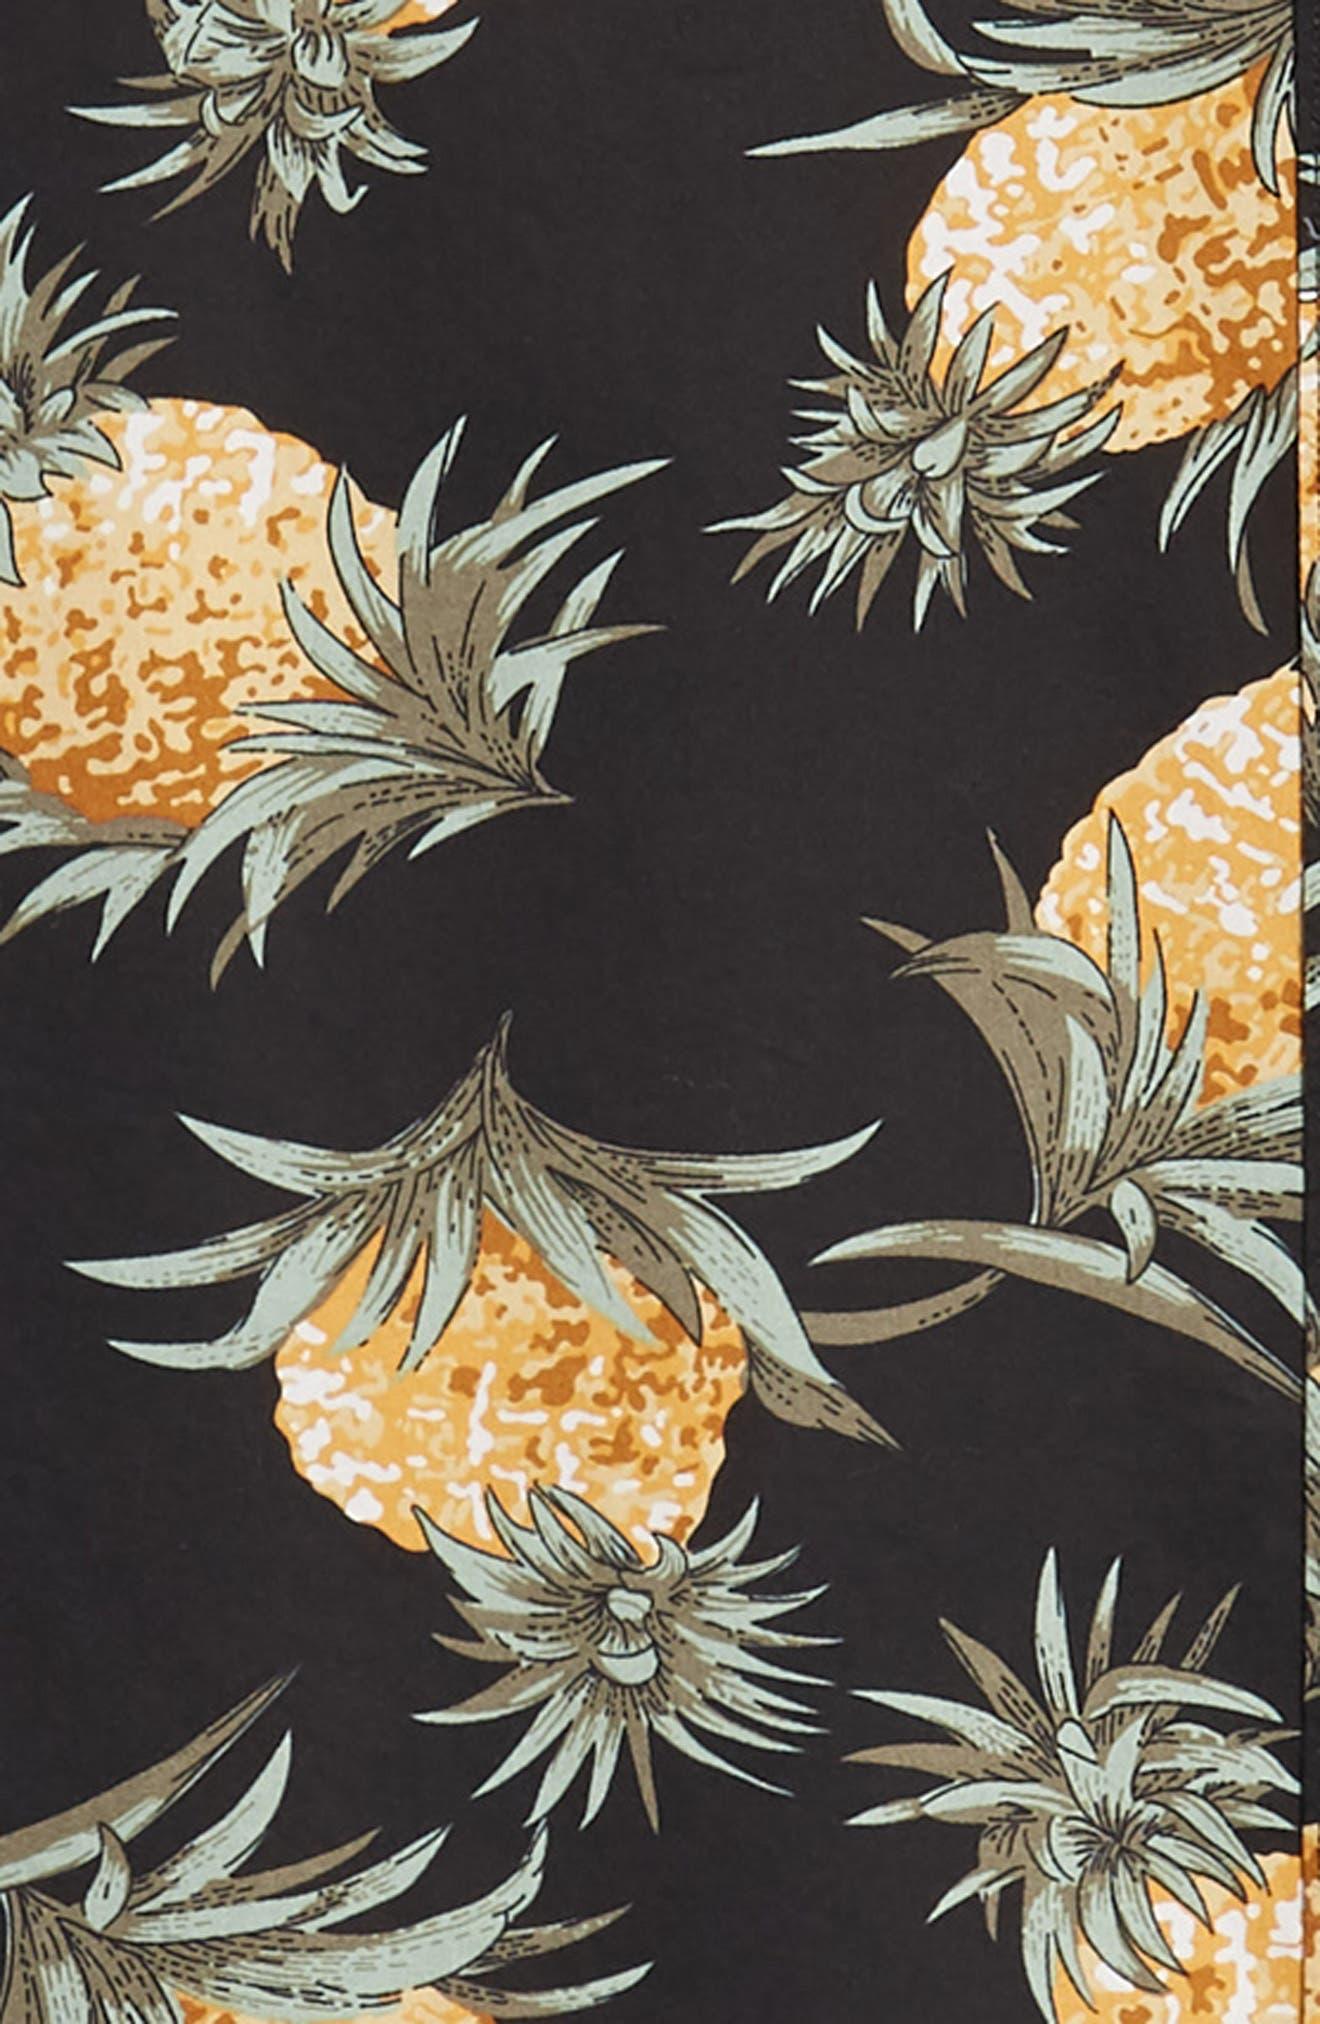 Summerweight Slim Fit Pineapple Print Sport Shirt,                             Alternate thumbnail 6, color,                             PINEAPPLES - JET BLACK